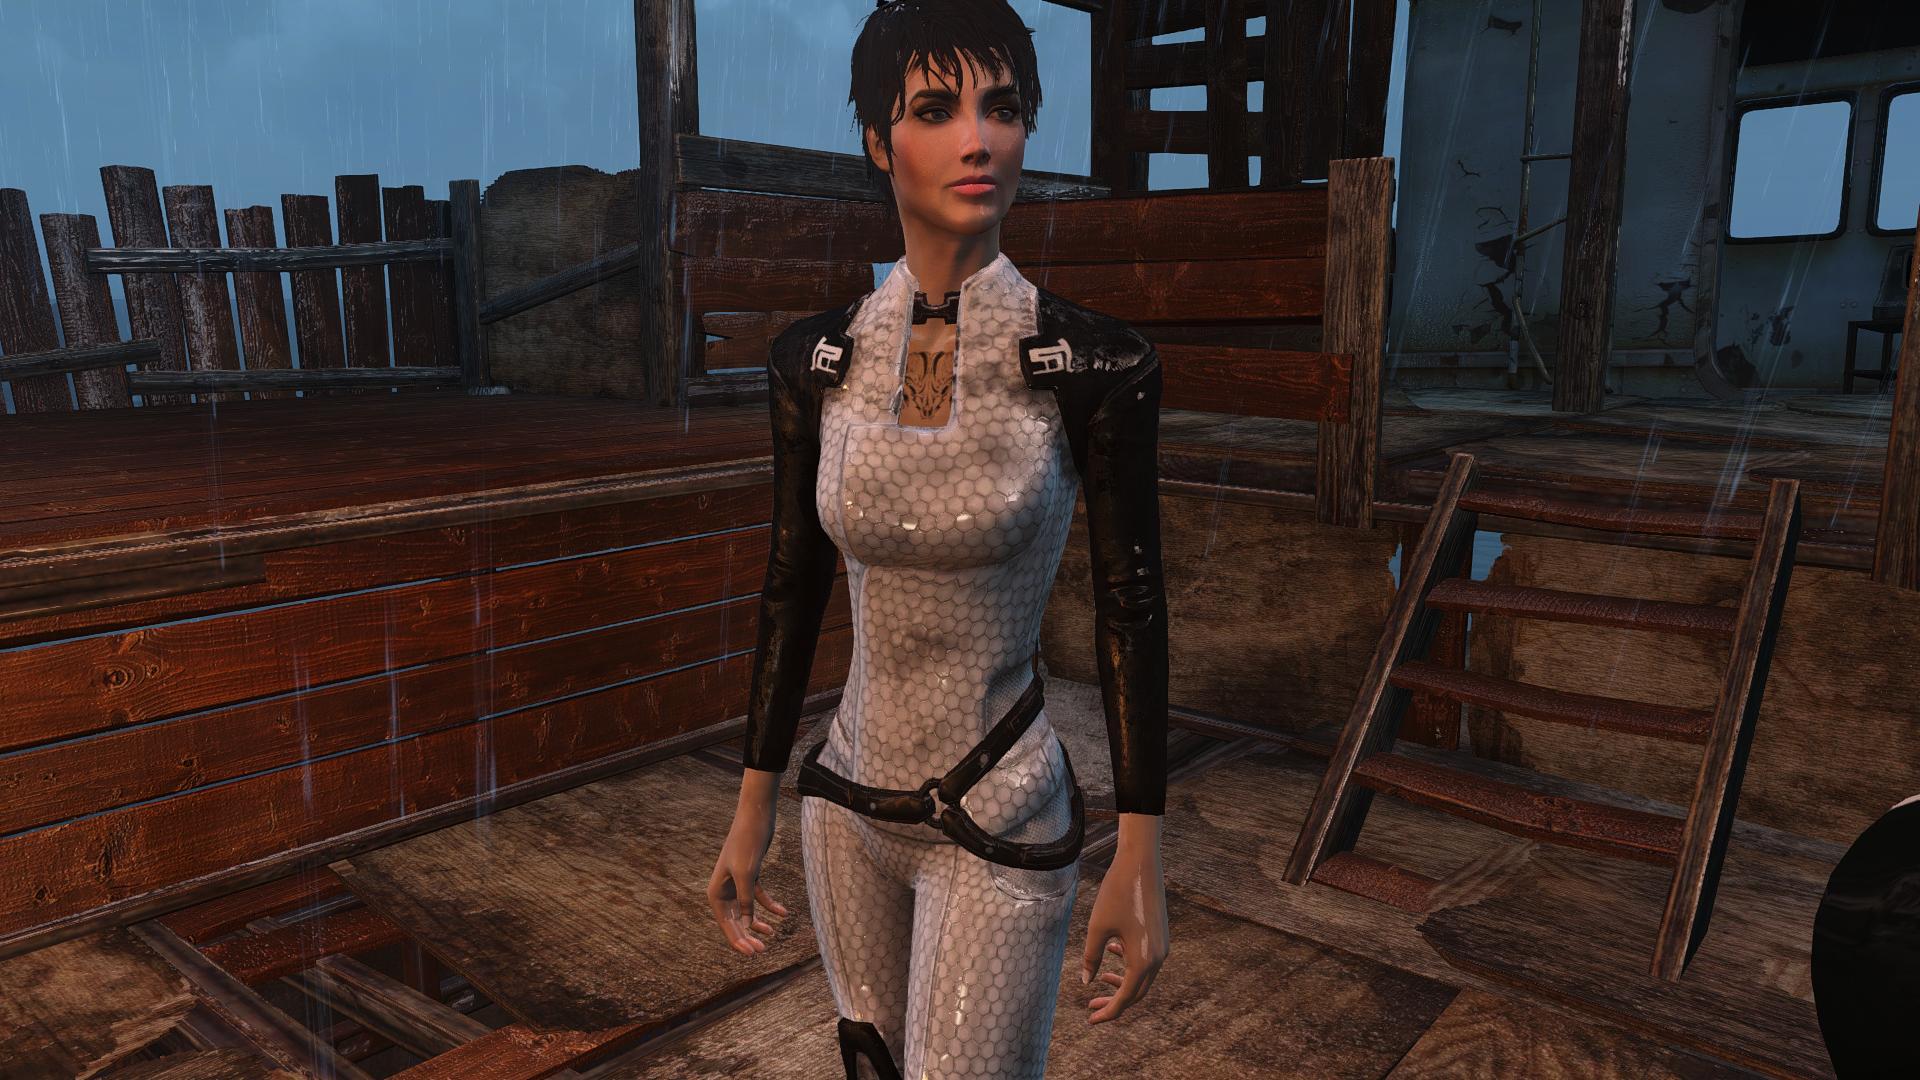 000512.Jpg - Fallout 4